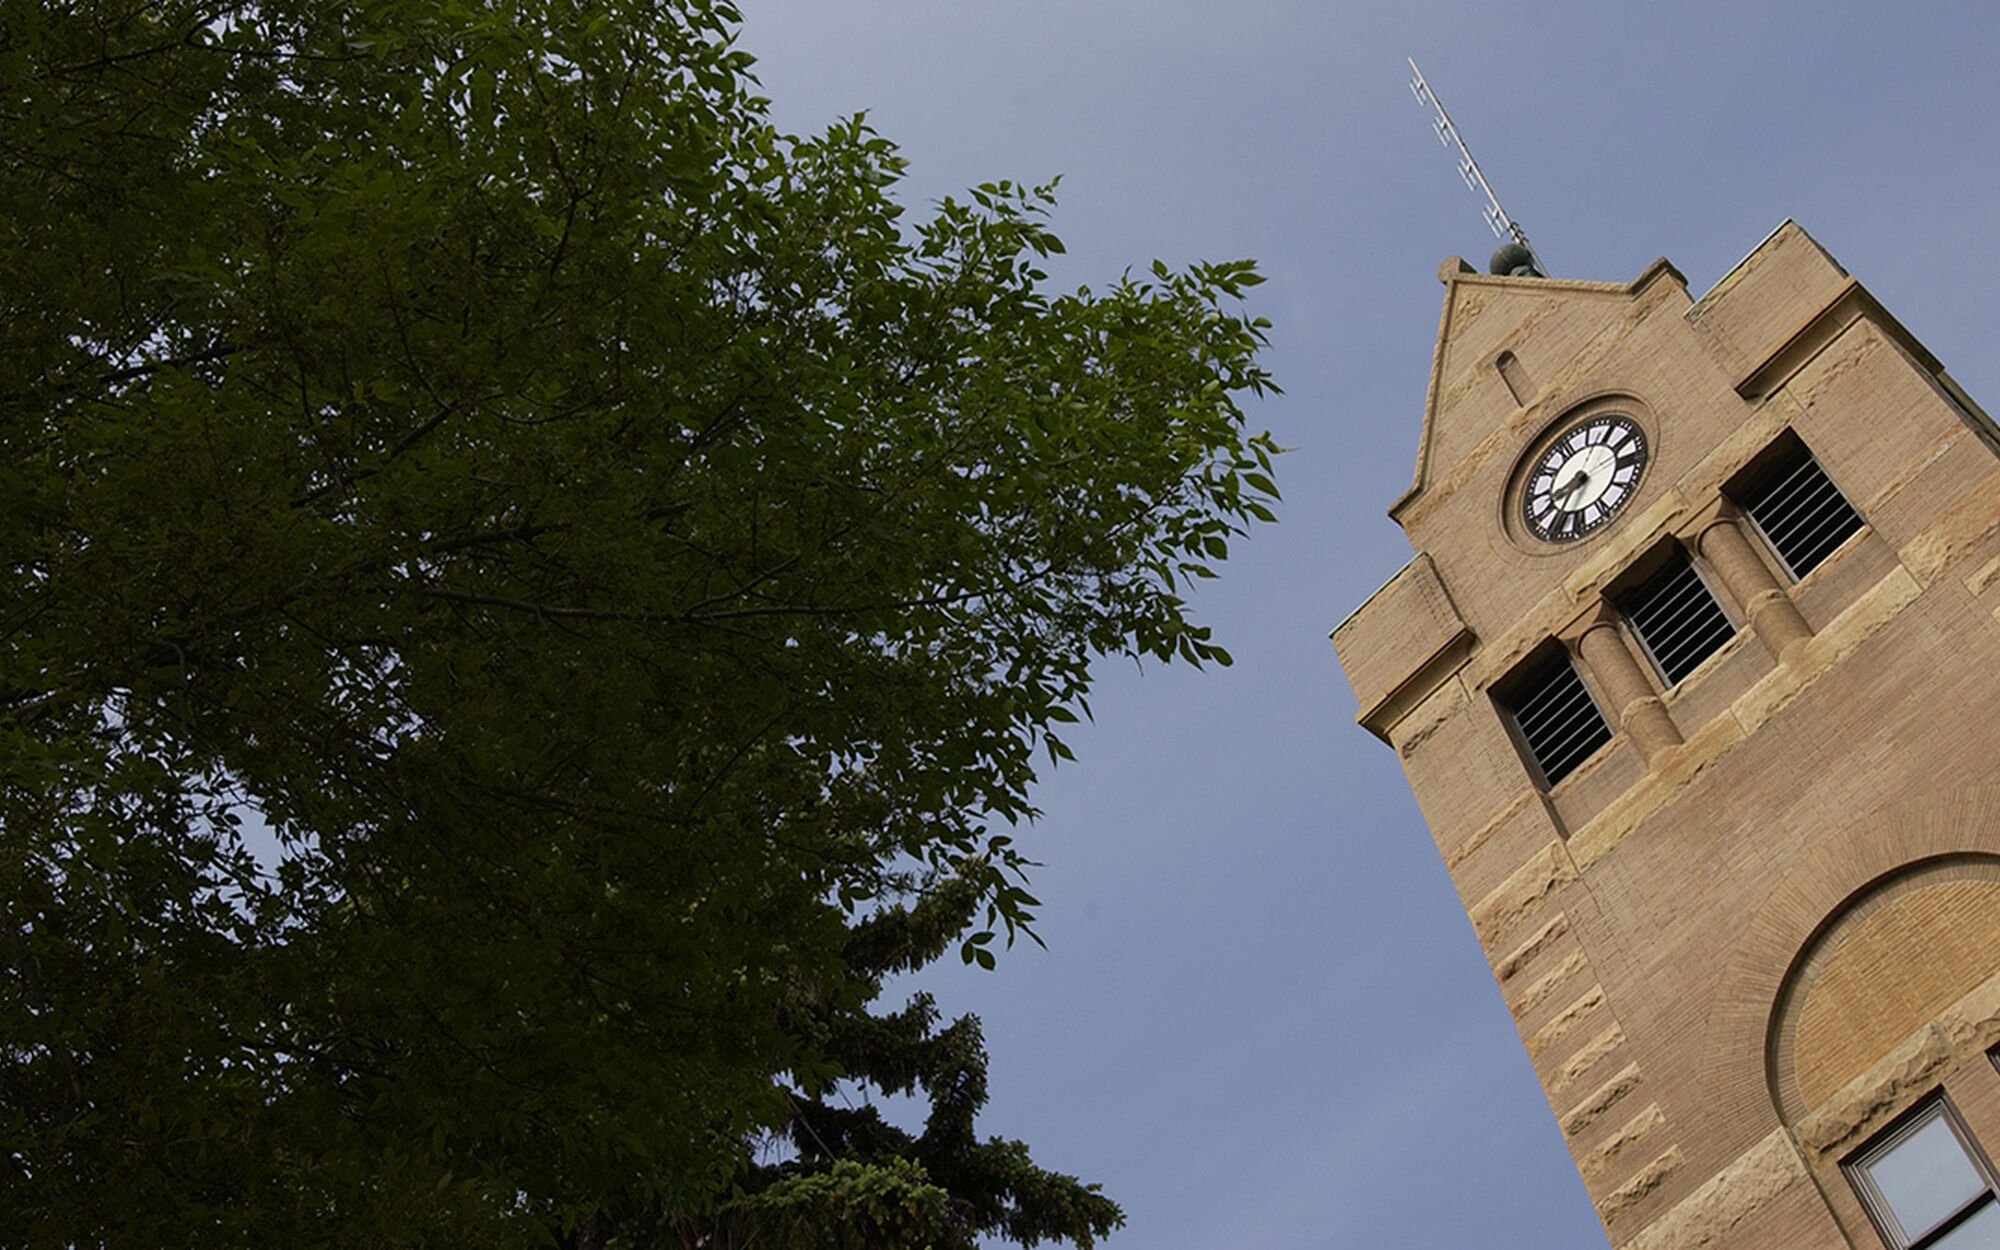 Waseca City Hall